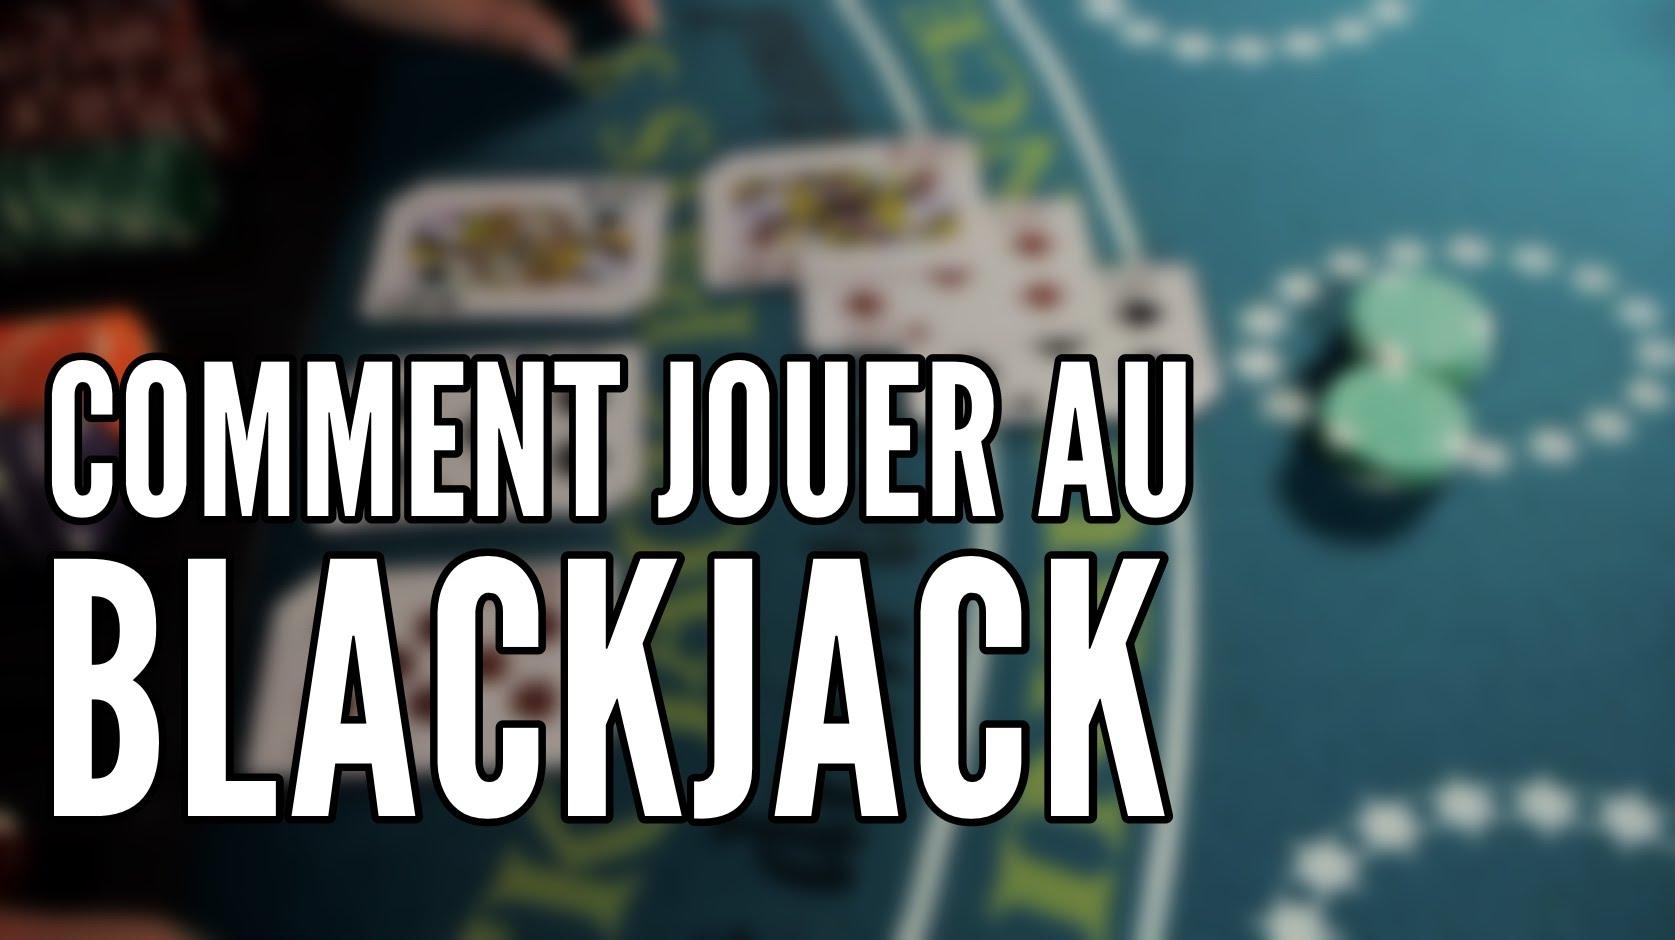 imagesjeu-blackjack-21.jpg